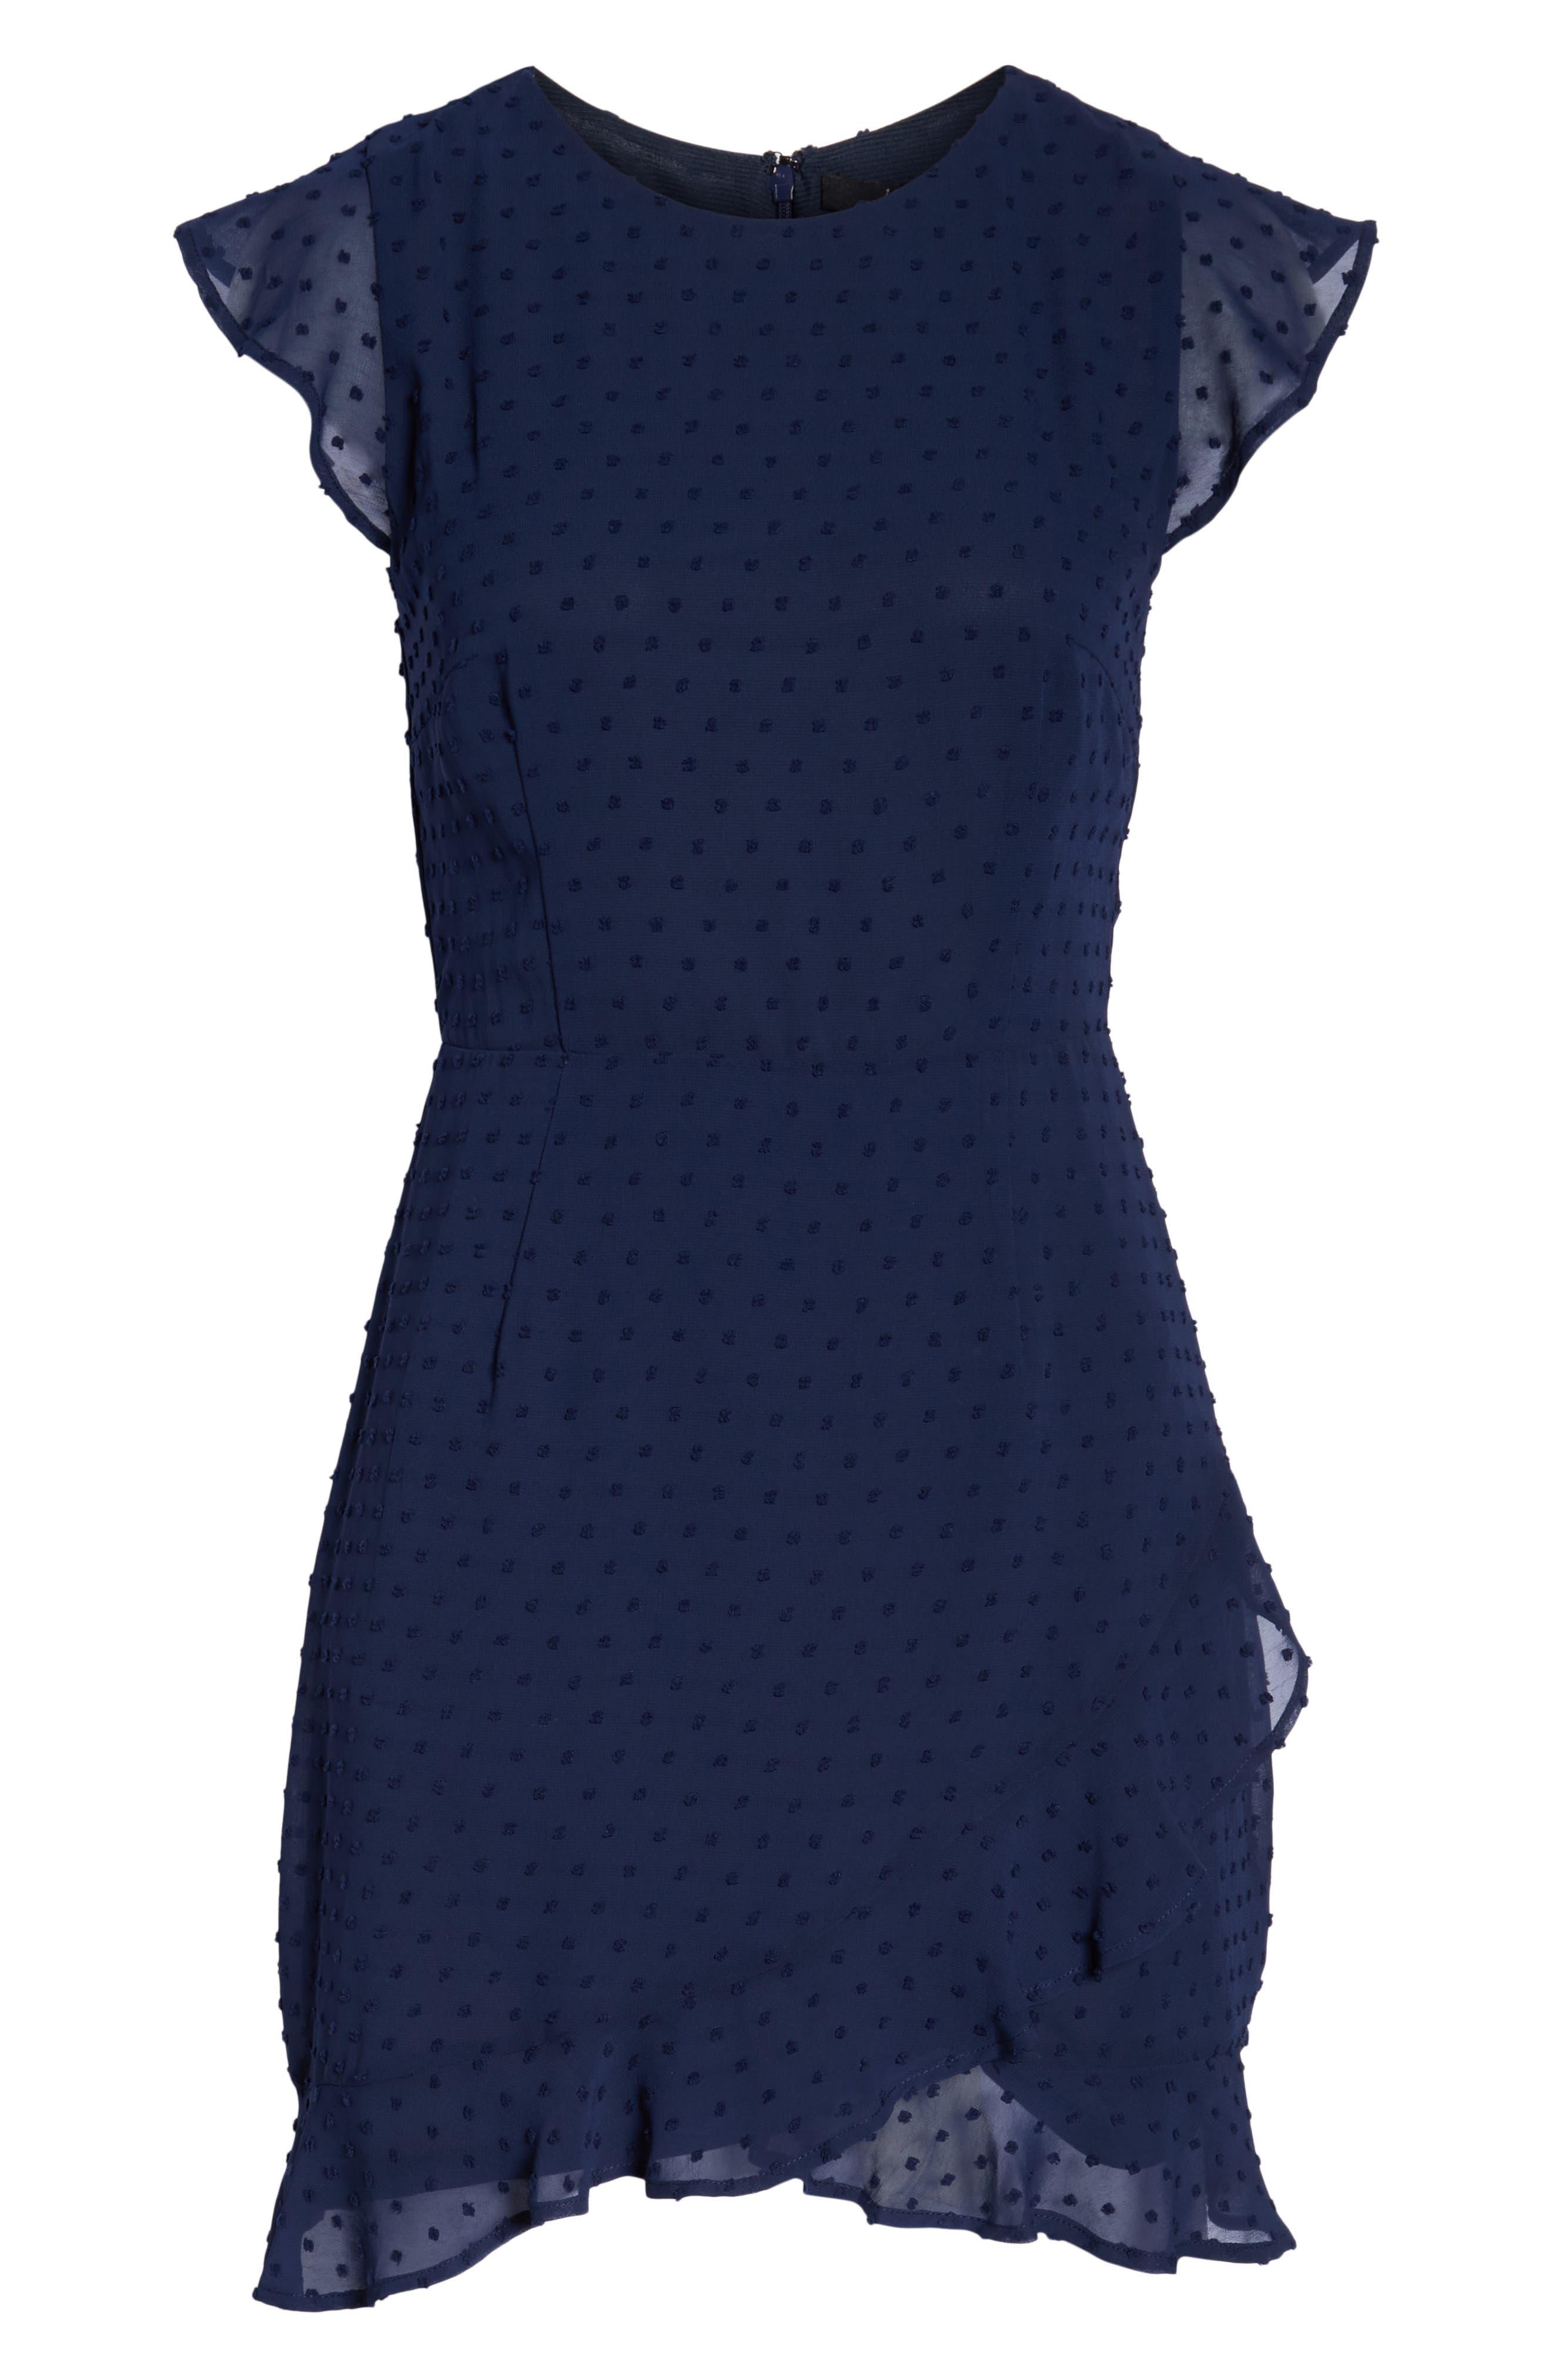 19 COOPER, Swiss Dot Ruffle Dress, Alternate thumbnail 7, color, 410